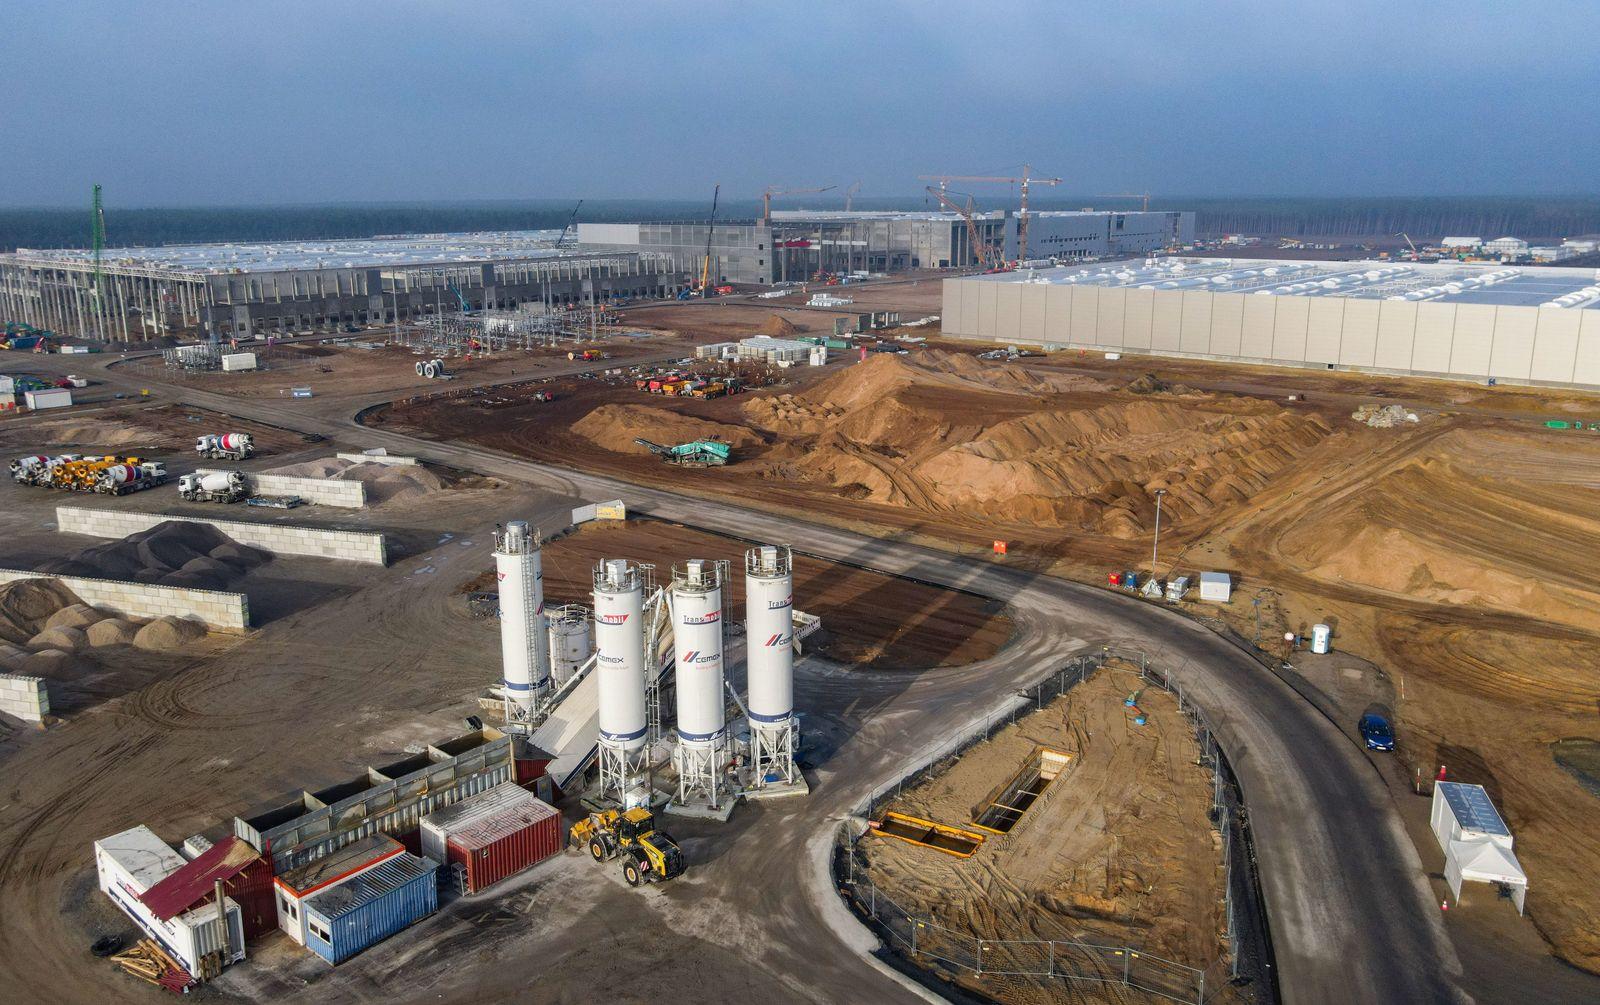 Baustelle der Tesla Giga-Factory in Grünheide